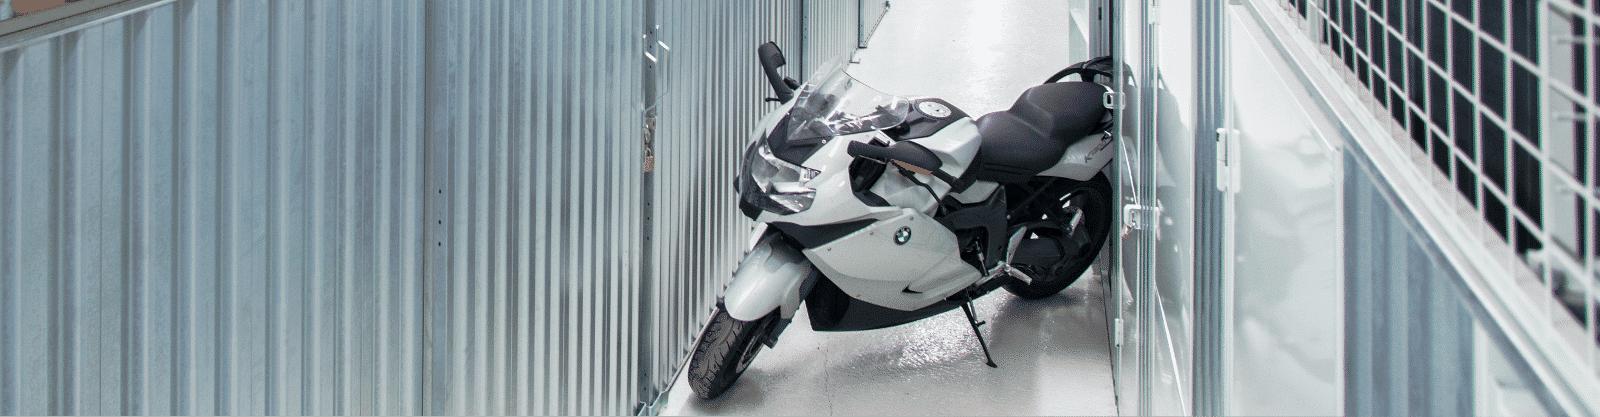 Interesseret i motorcykelopbevaring i Horsens ?